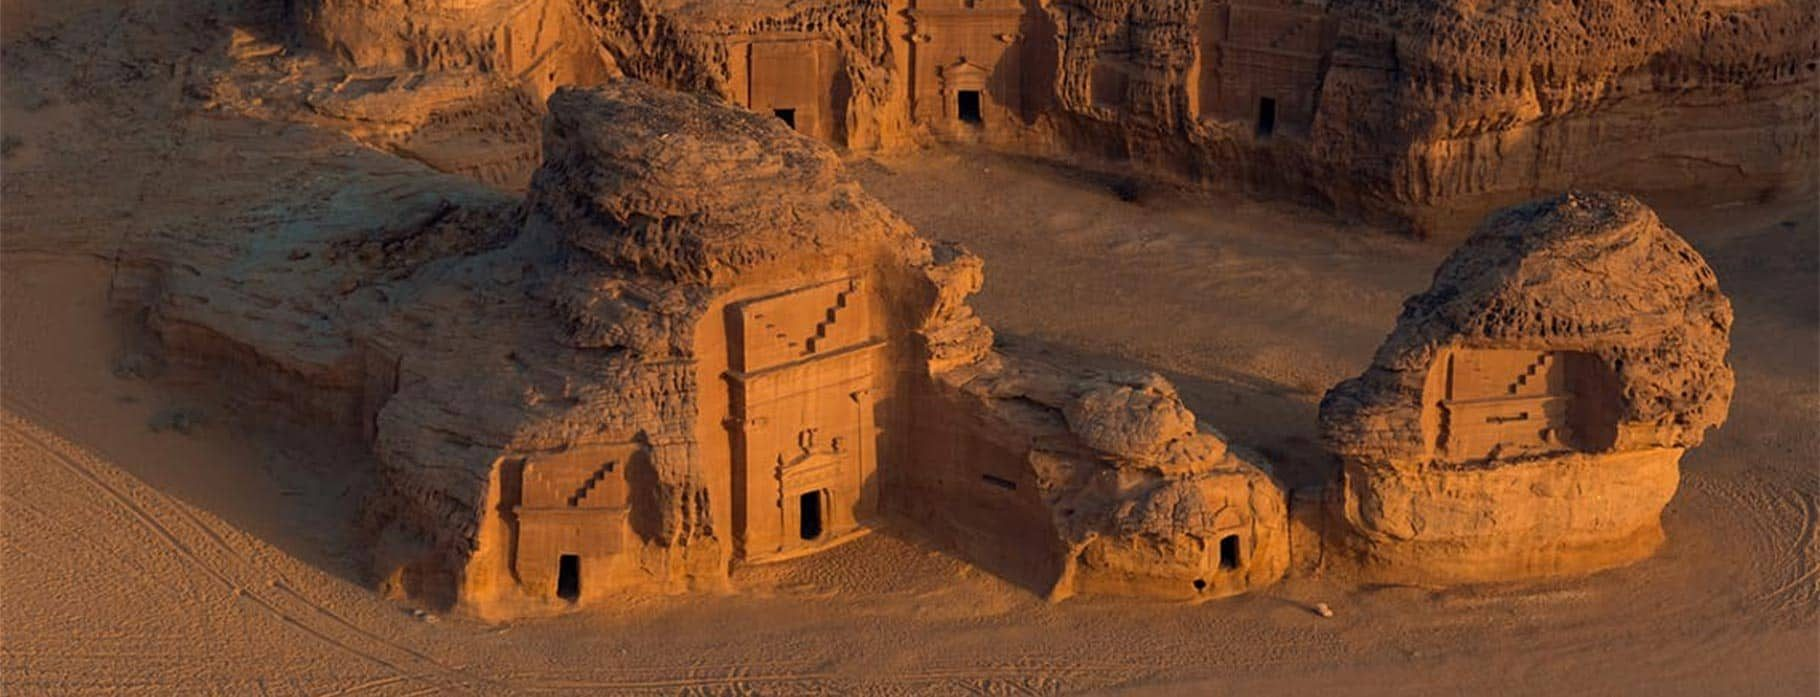 8 DAYS REVEALING THE AURA OF SAUDI ARABIA